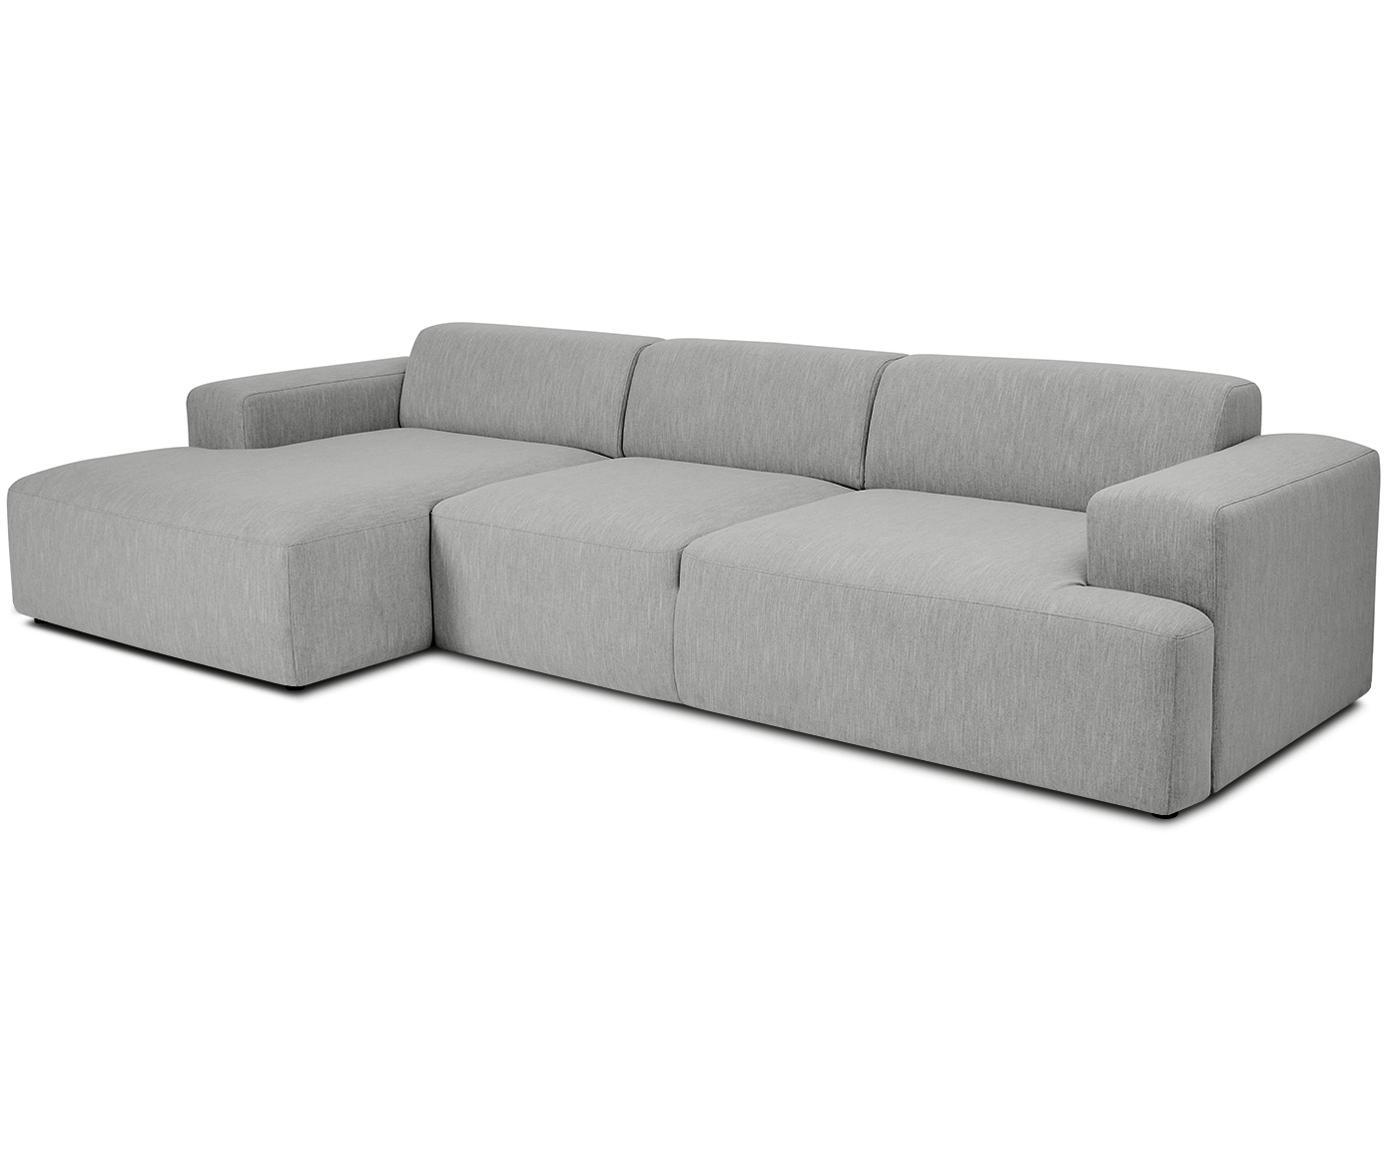 Ecksofa Melva (4-Sitzer), Bezug: Polyester 35.000 Scheuert, Gestell: Massives Kiefernholz, Spa, Füße: Kiefernholz, Webstoff Grau, B 319 x T 144 cm